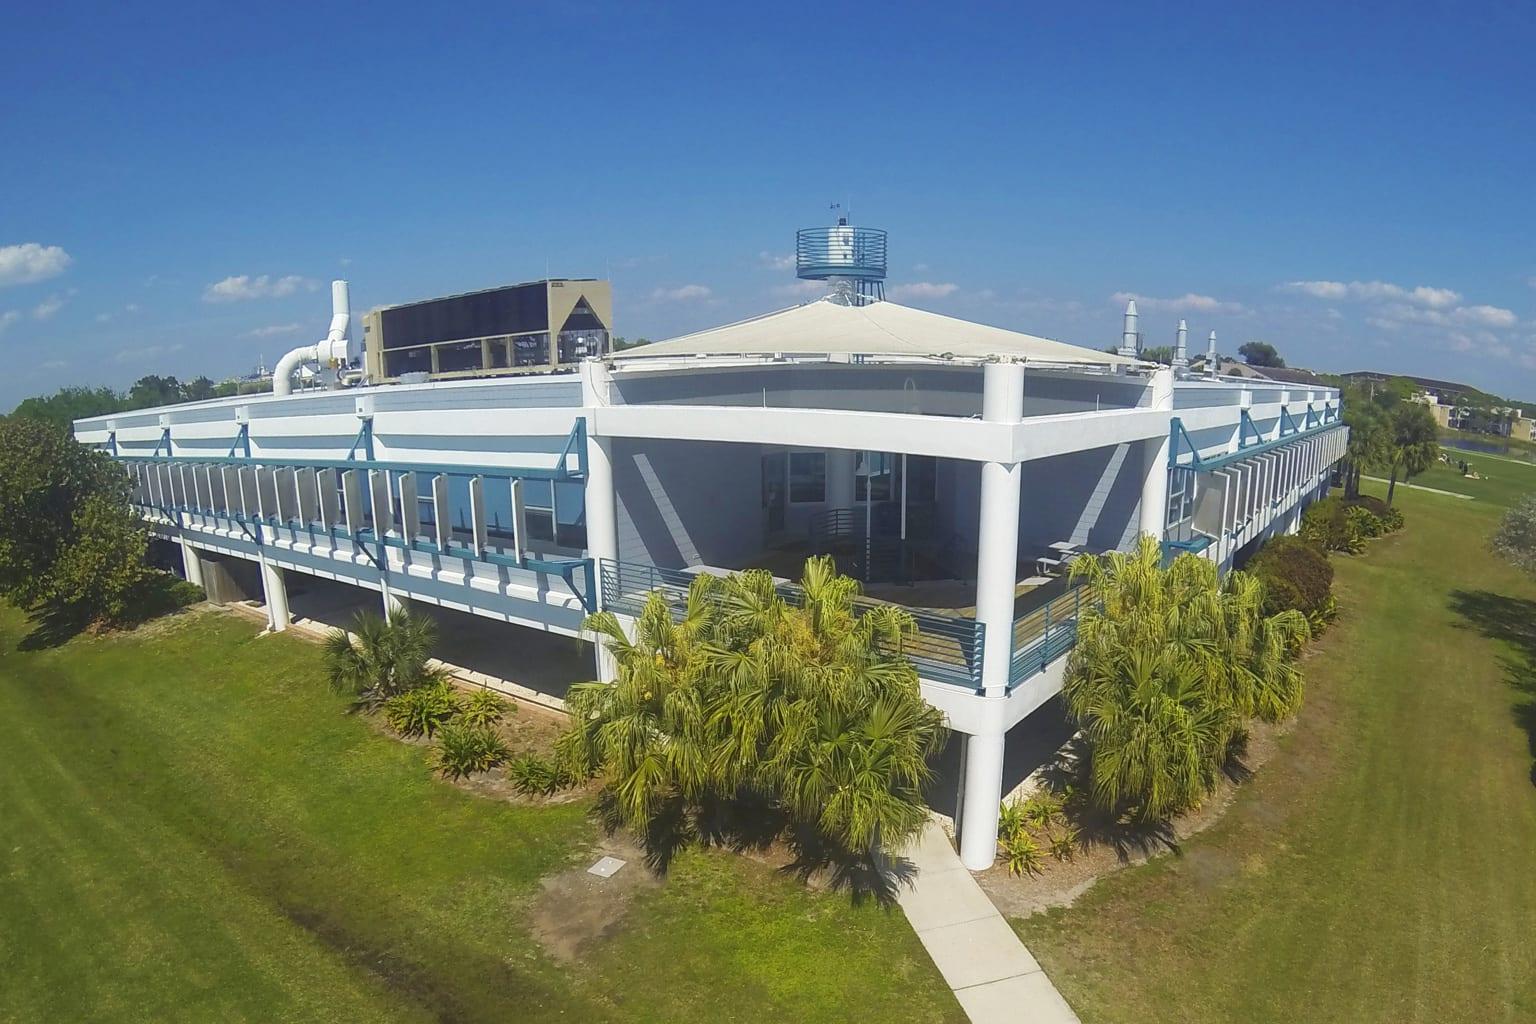 Galbraith Marine Science Laboratory aerial view